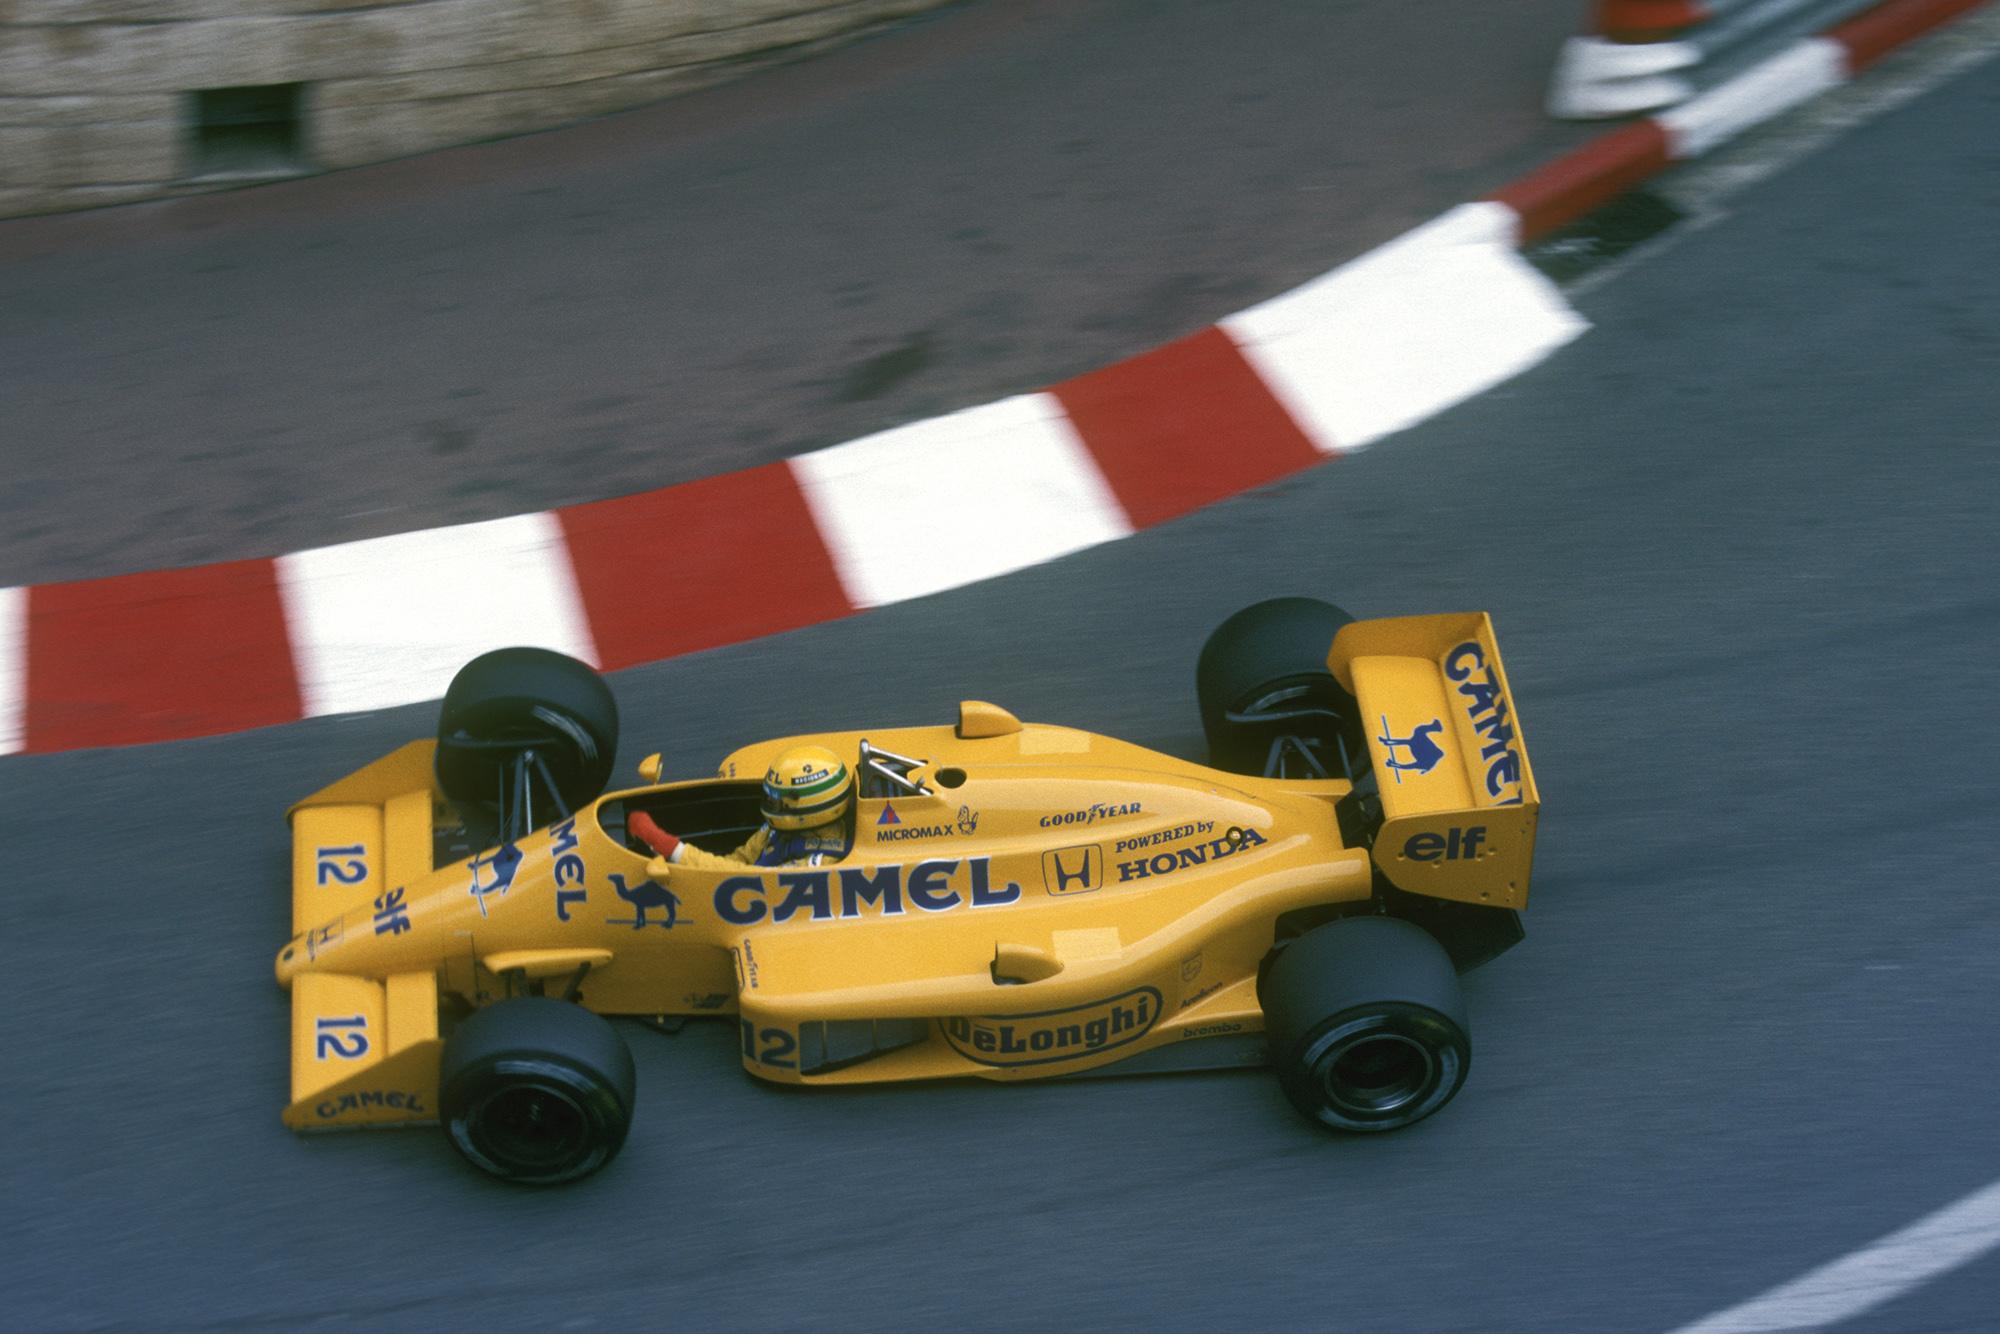 Ayrton Senna during the 1987 Monaco Grand Prix